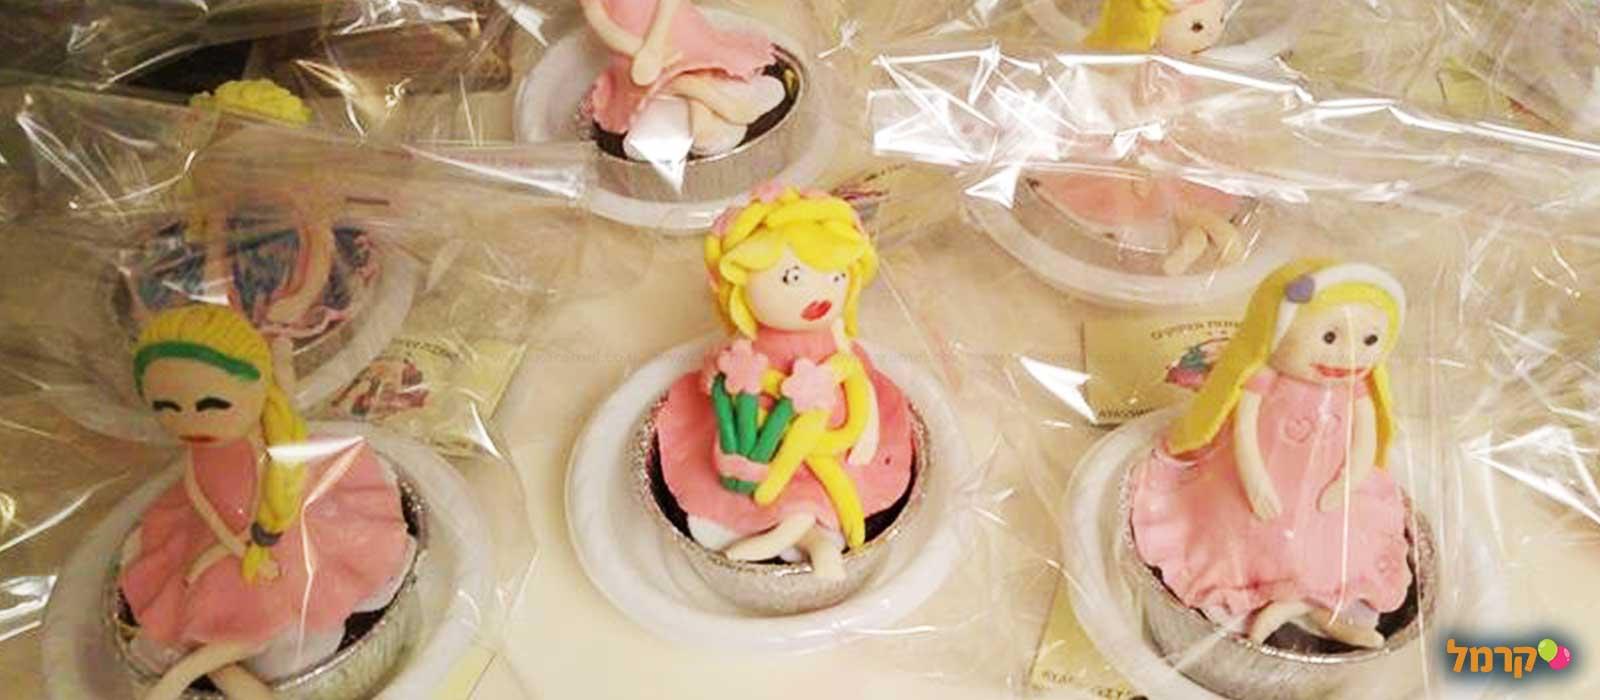 Aya's Sweets - 073-7597053